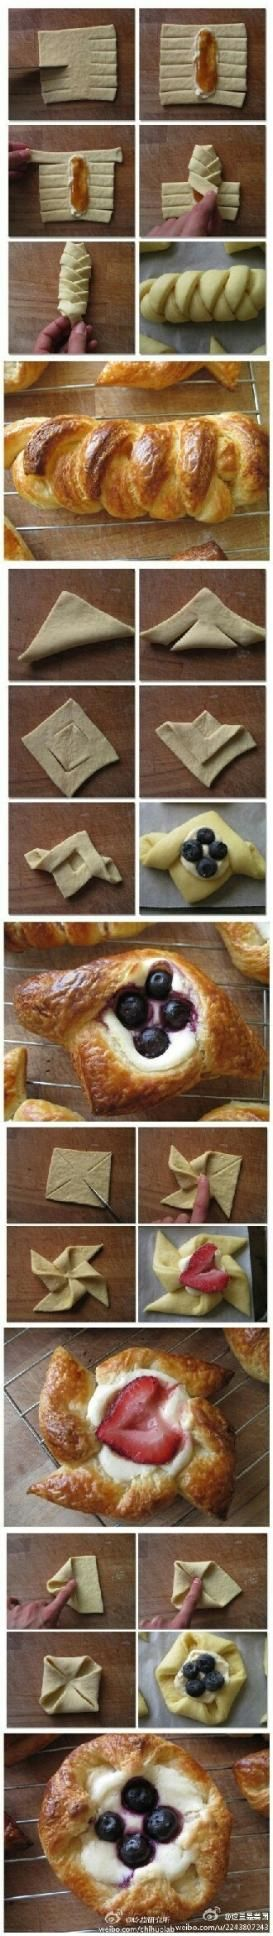 Pastry designs